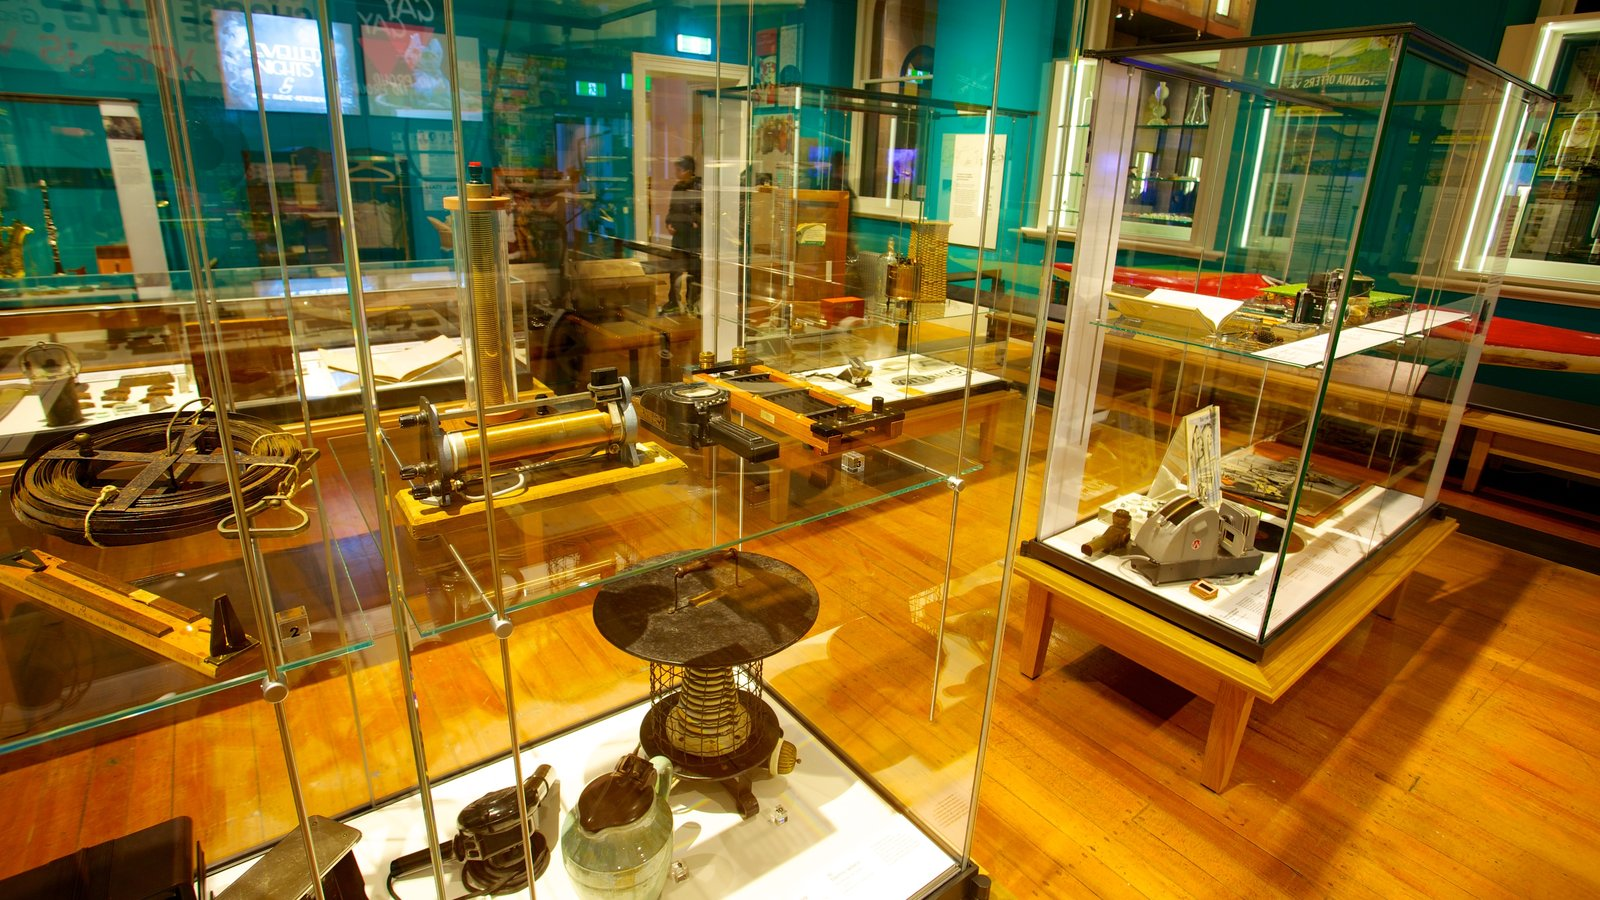 Tasmanian Museum and Art Gallery showing interior views